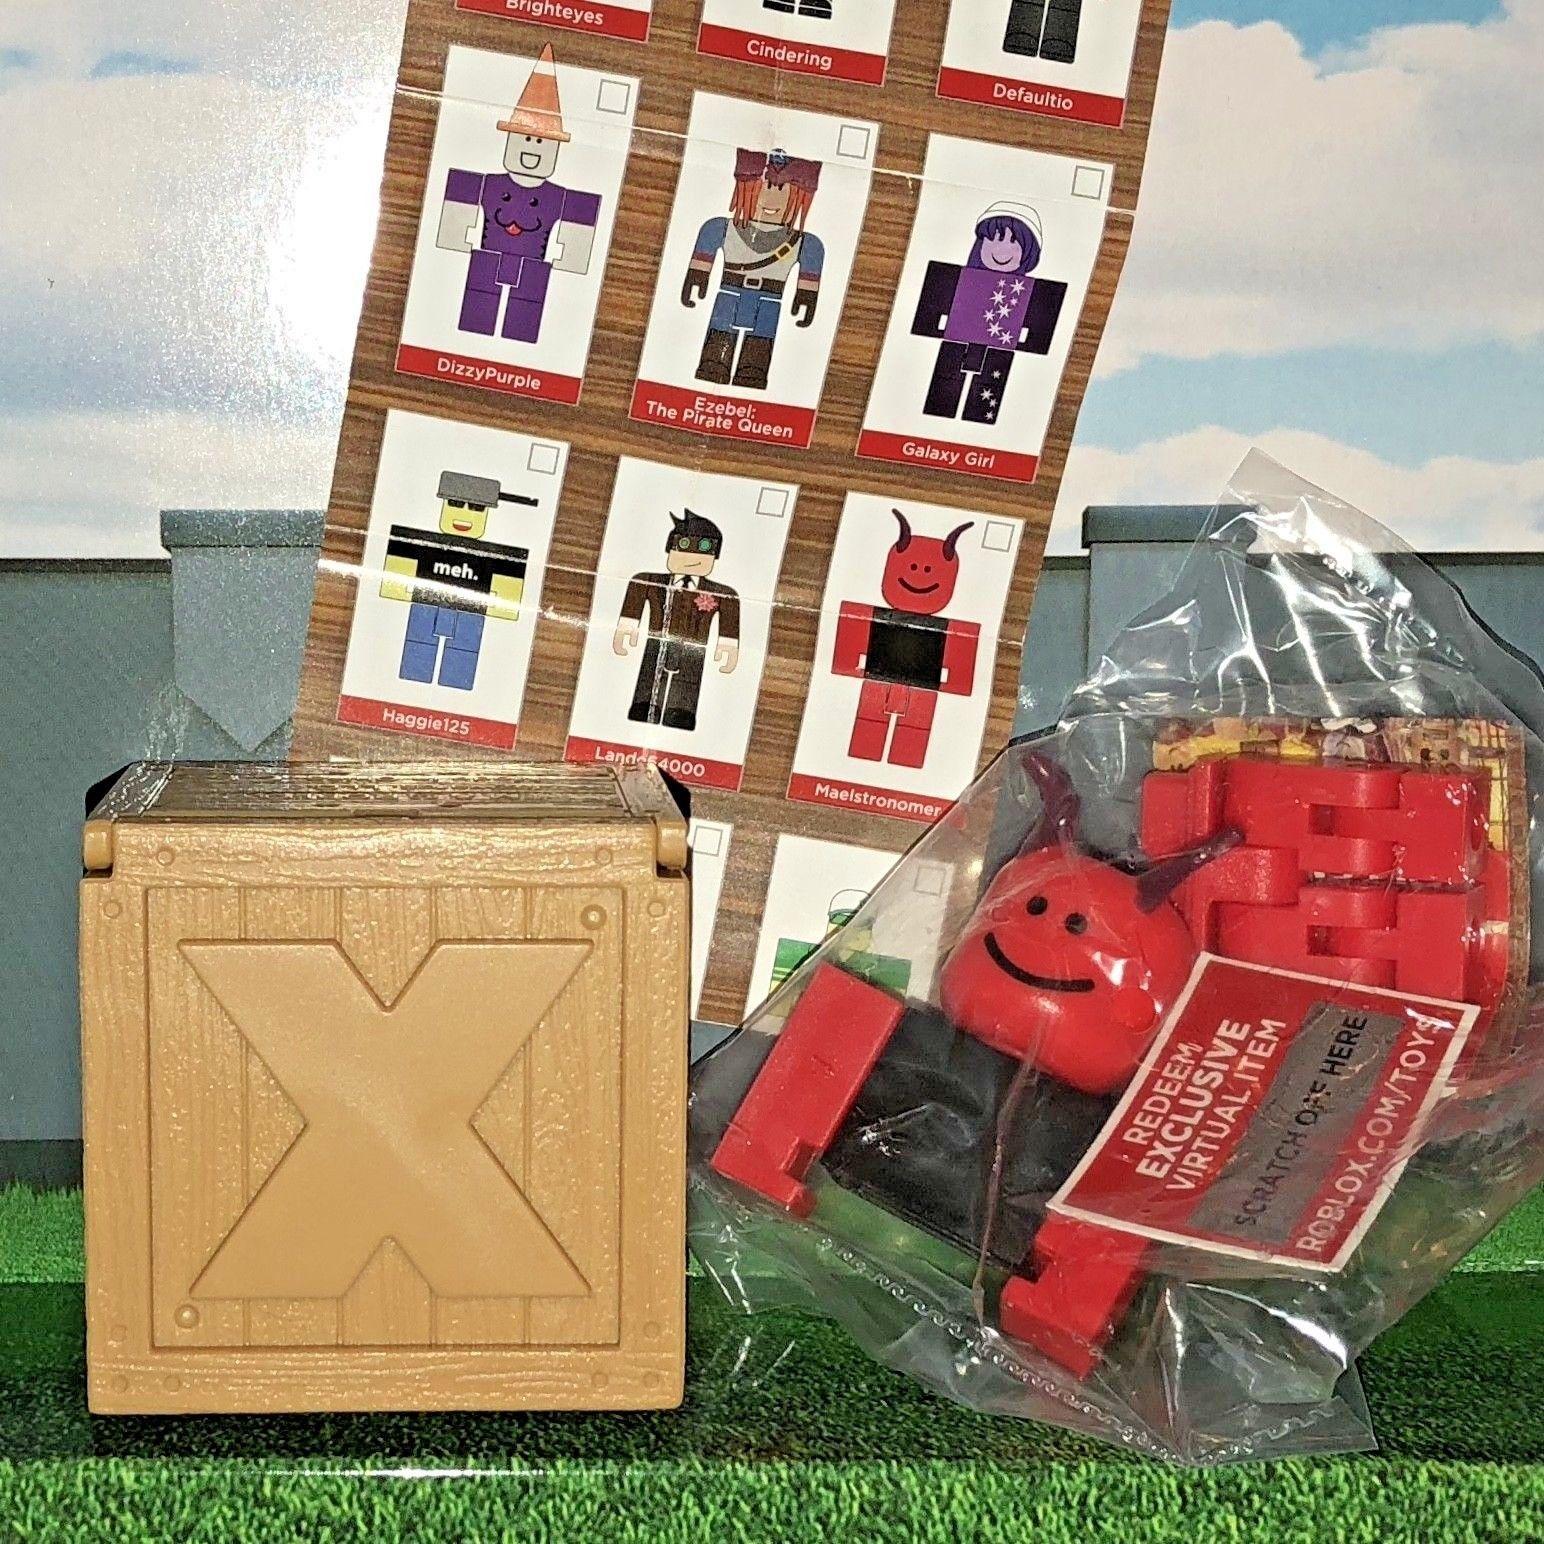 Haggie125 Roblox Mini Figure W Virtual Game Code Series 2 New Ebay - Maelstronomer Roblox Series 2 Mystery Packs 3 Figures Toys W